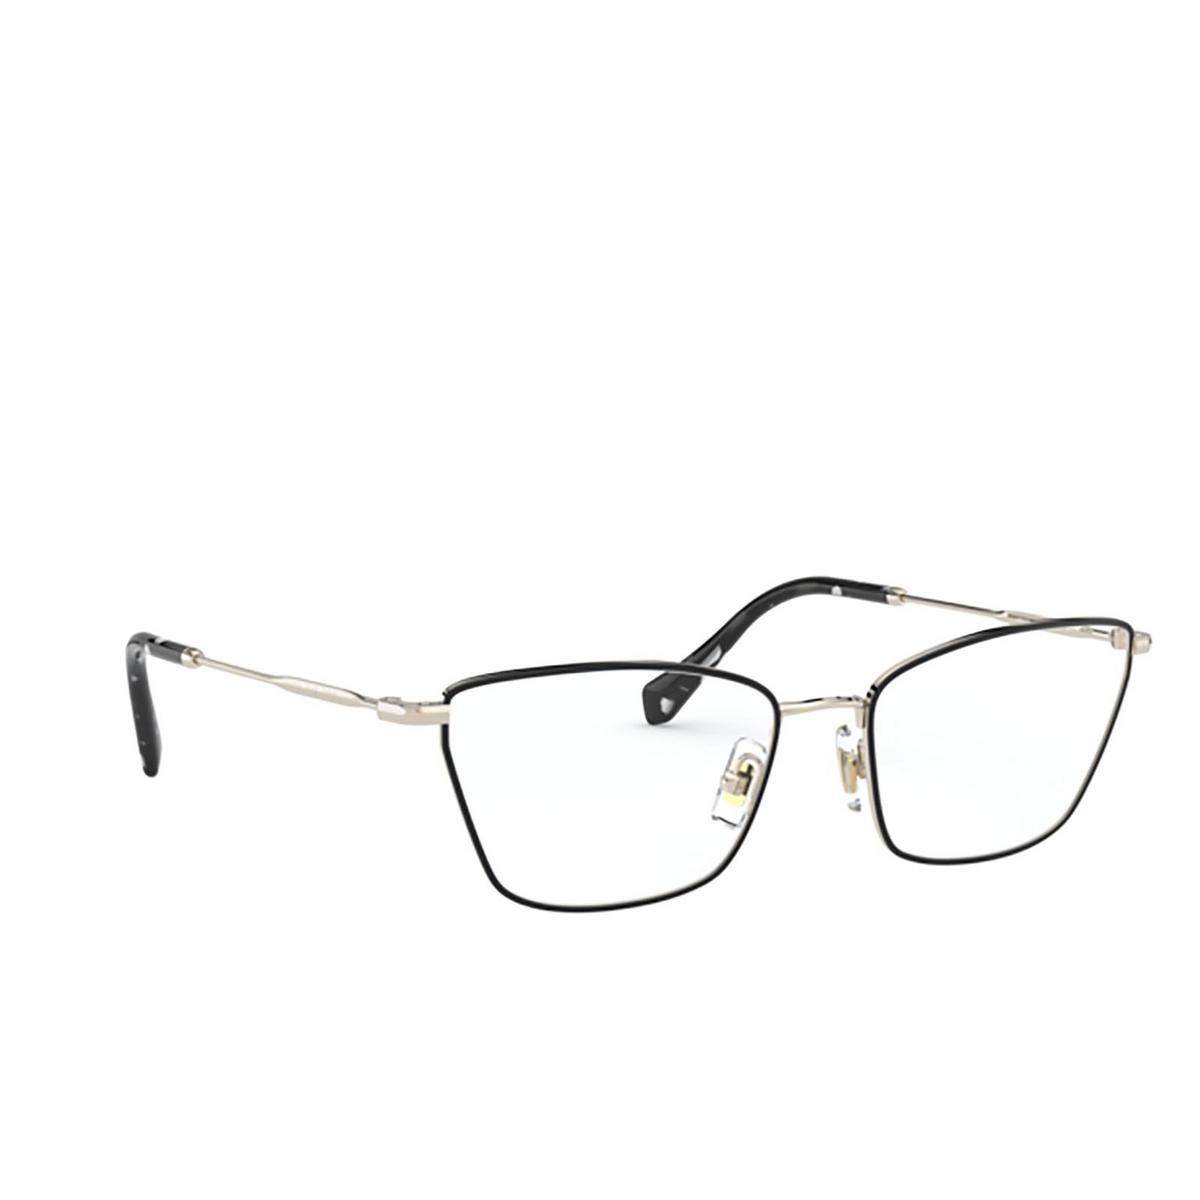 Miu Miu® Cat-eye Eyeglasses: MU 52SV color Pale Gold / Black AAV1O1 - three-quarters view.